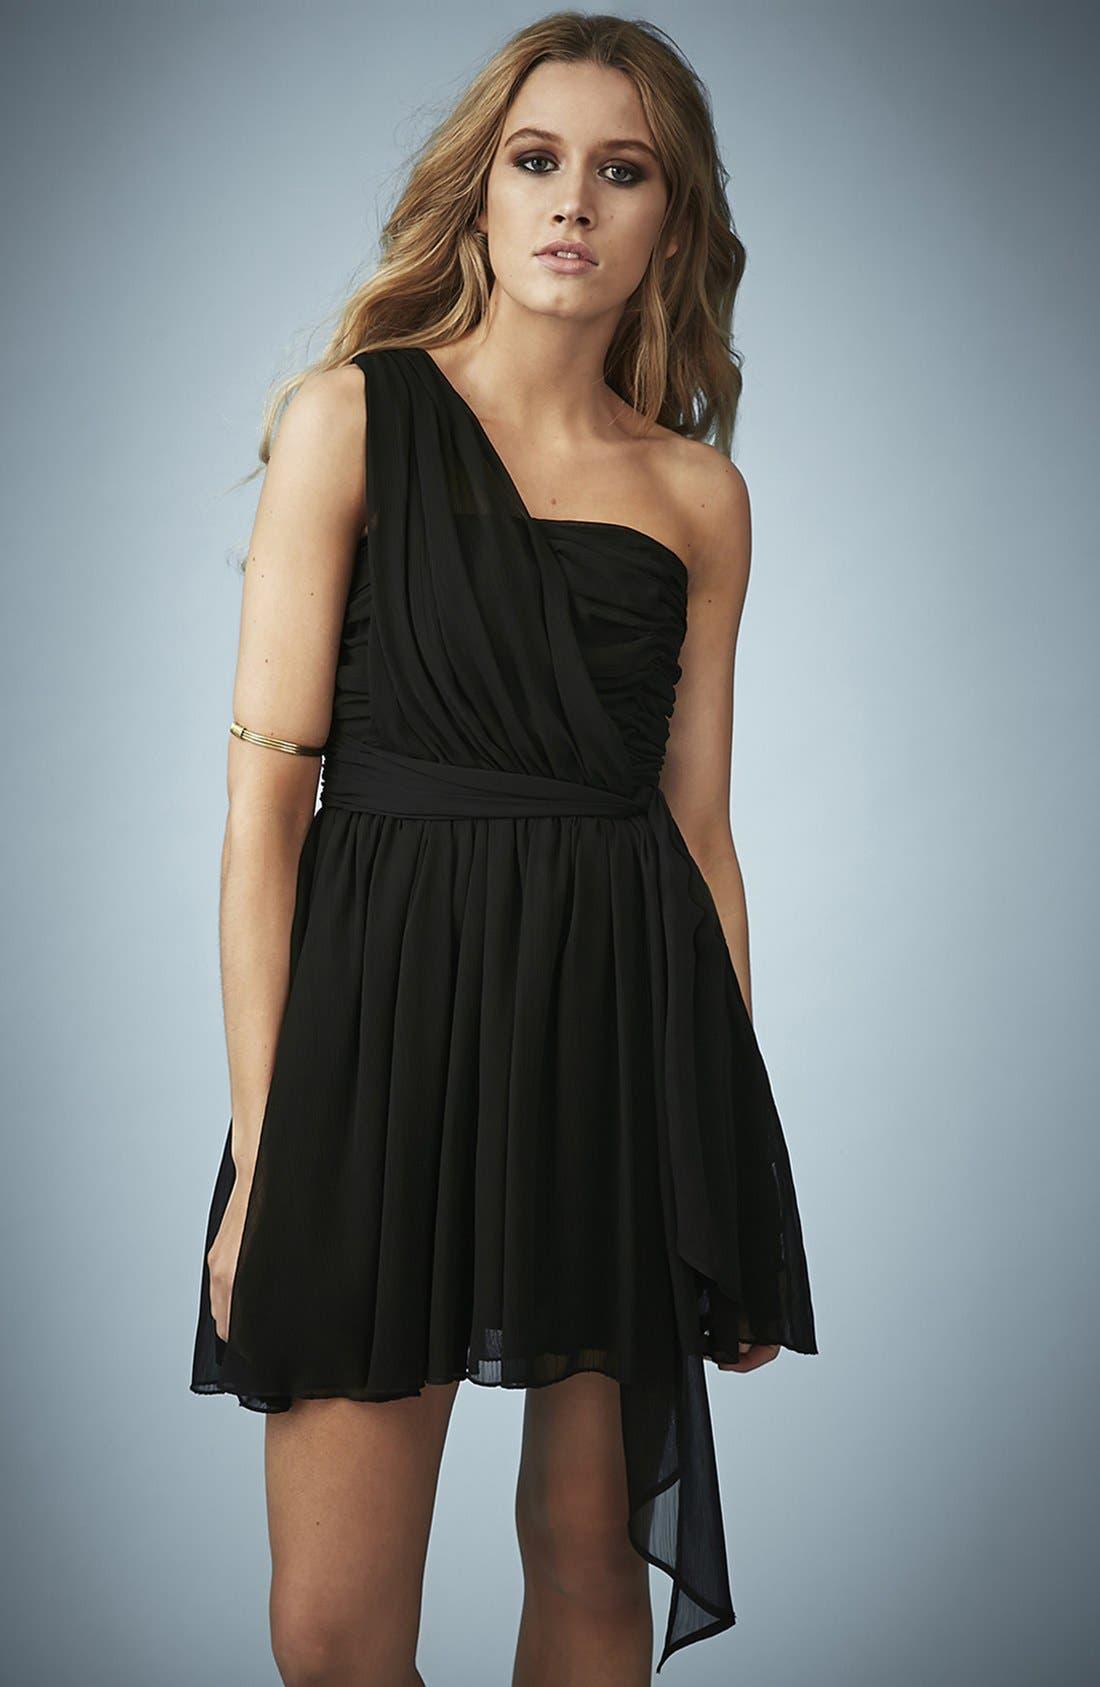 TOPSHOP Kate Moss for Topshop One-Shoulder Chiffon Dress, Main, color, 001